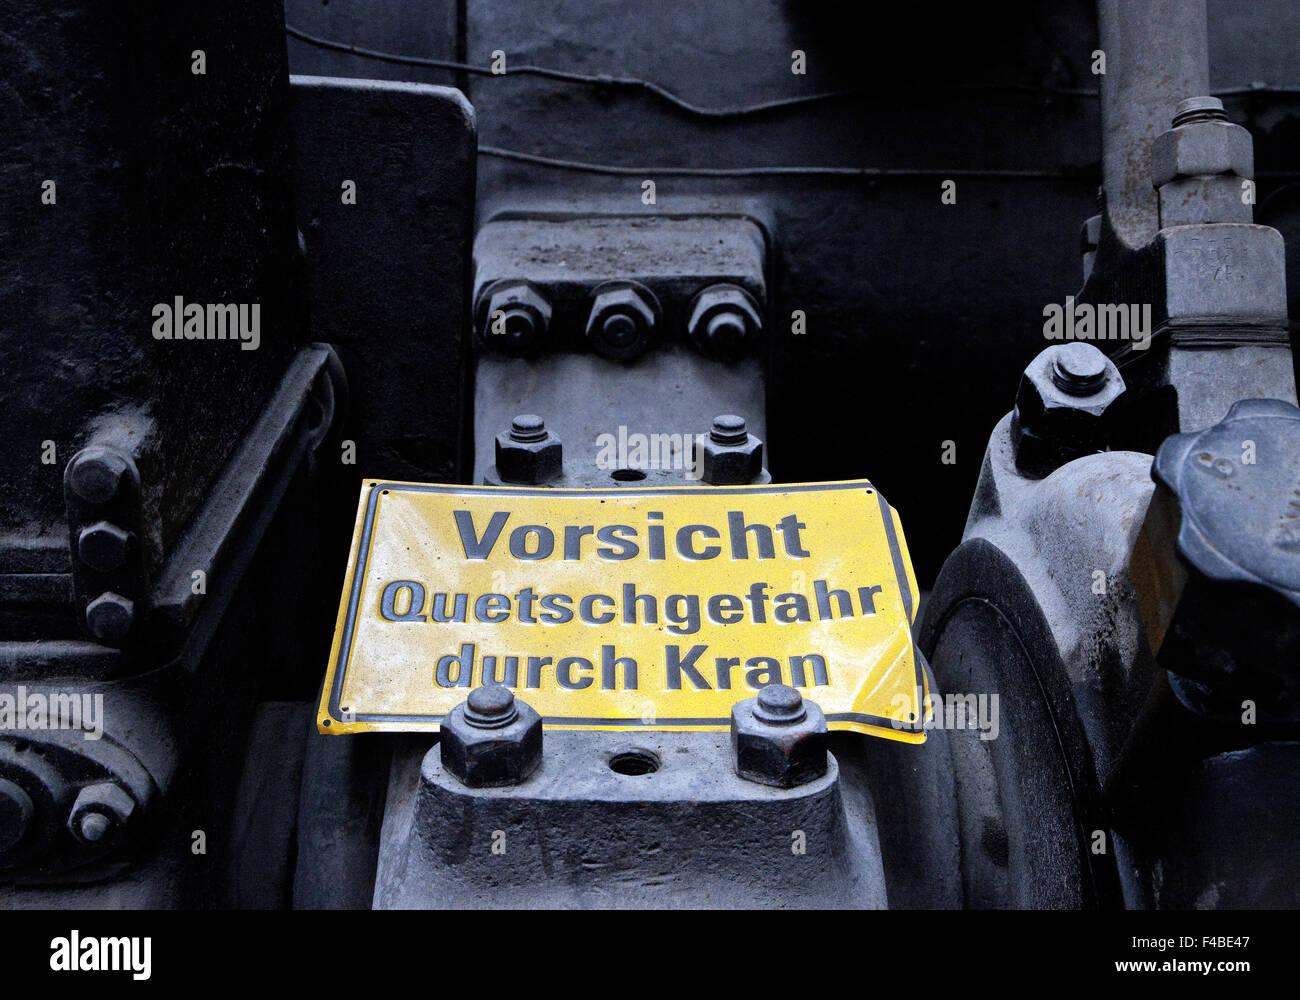 Henrichshuette Hattingen Steelworks, Germany. - Stock Image